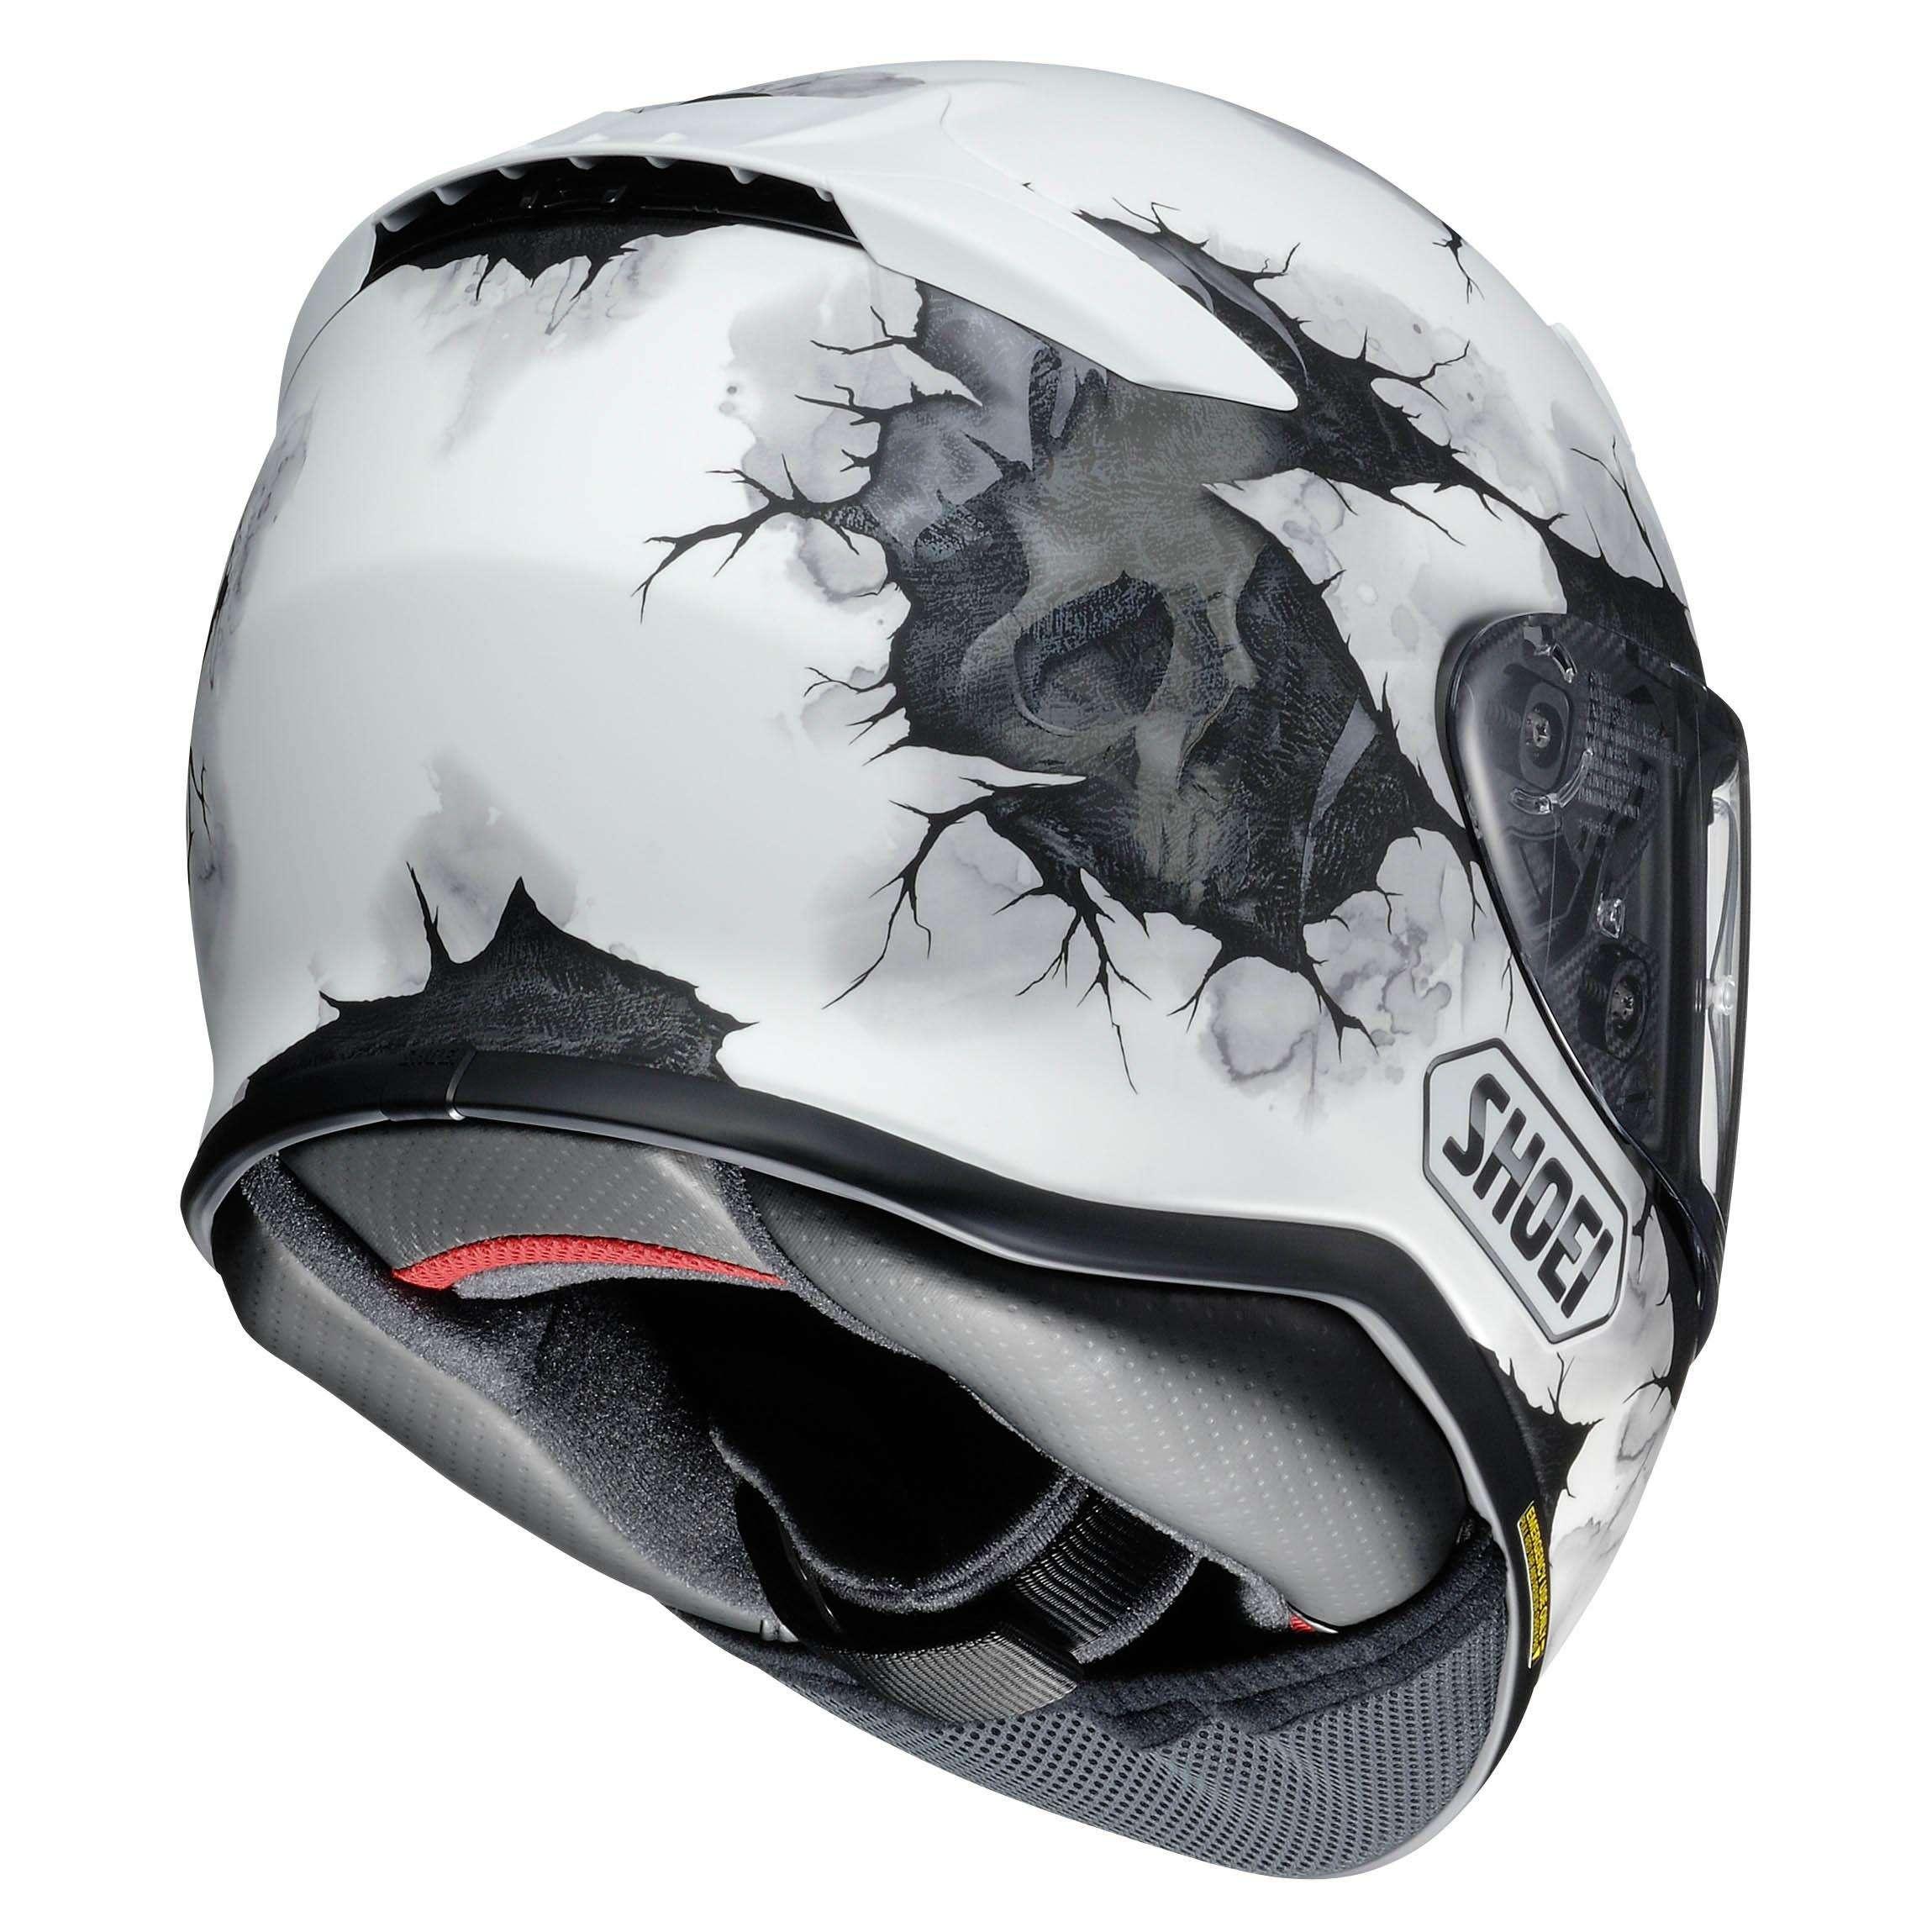 d609a641 Shoei NXR Full Face Motorcycle Helmet Ruts TC 6 White X-SMALL ...